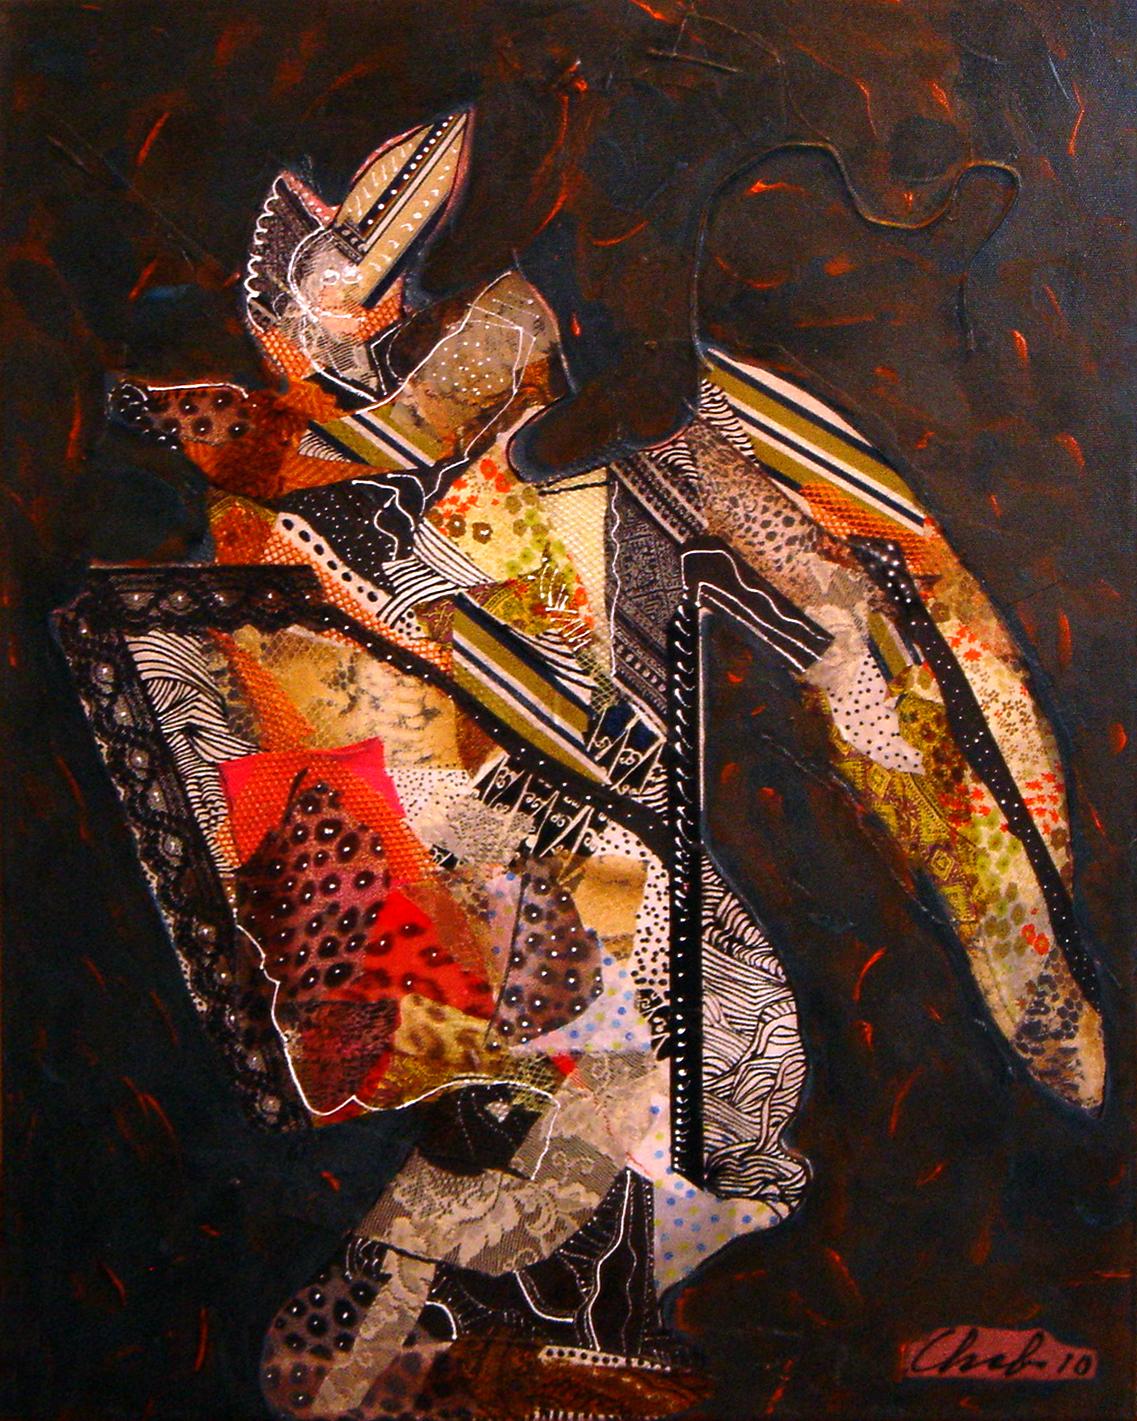 "<strong>""Allegro Vivace"" (2010)</strong><br>Collage y acrílico s/tela 100 x 80 cm"